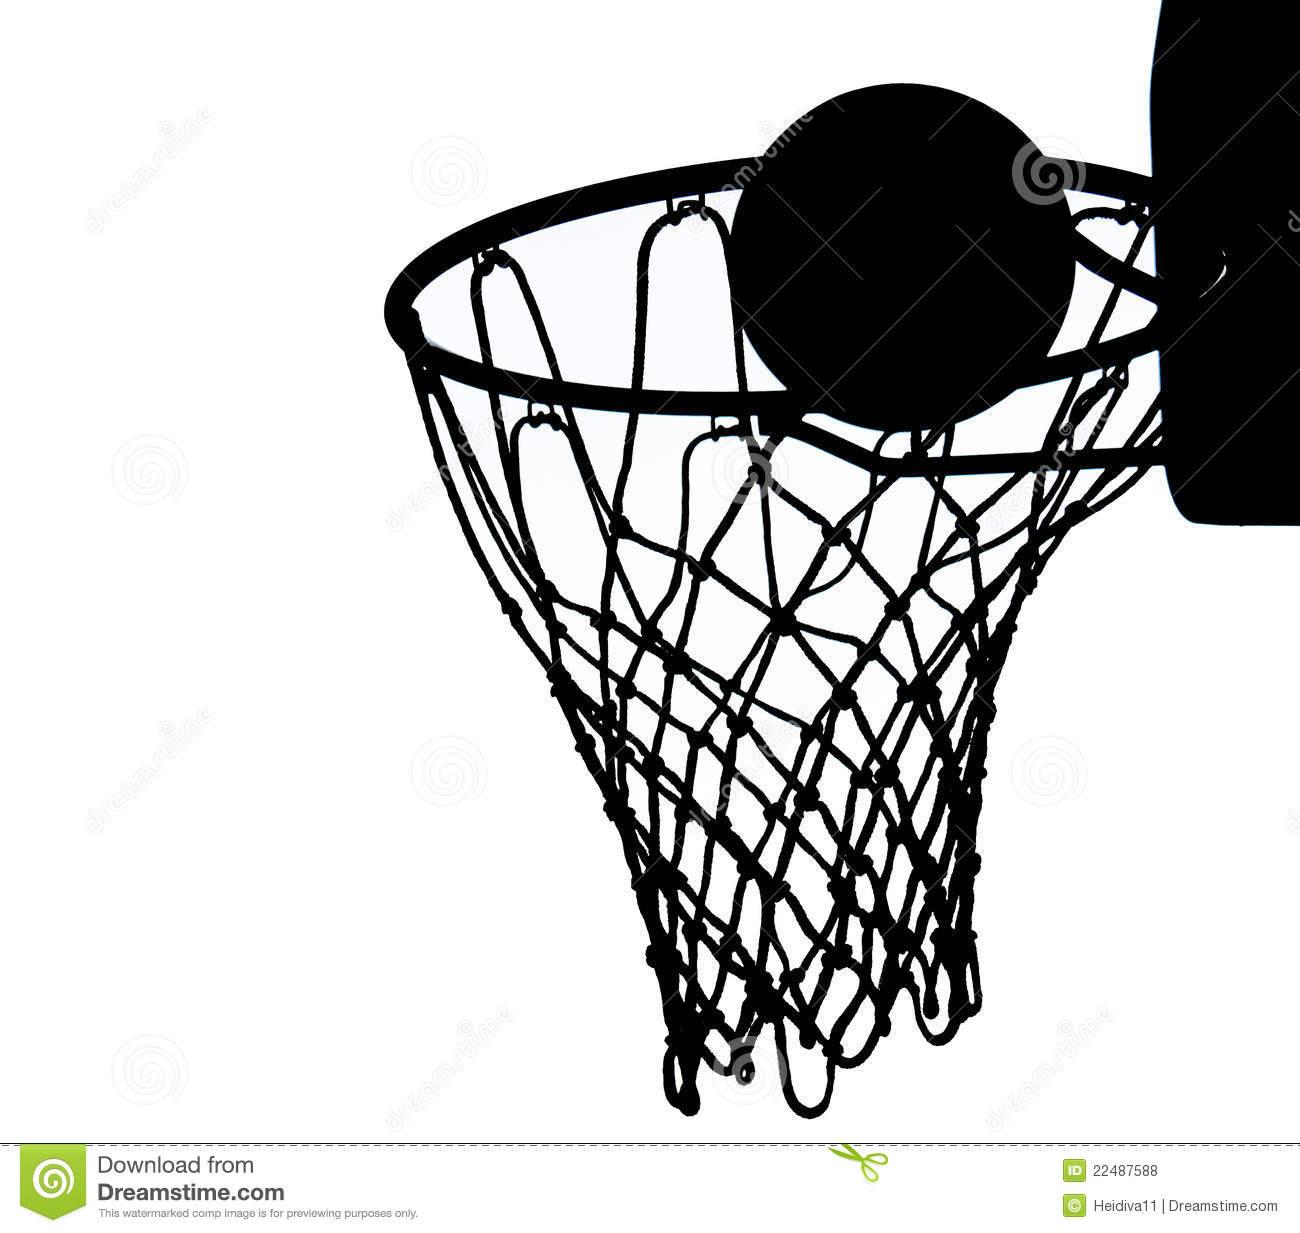 http://www.clipartkid.com/images/60/basketball-net-vector-basketball-silhouette-J3tA3d-clipart.jpg Basketball